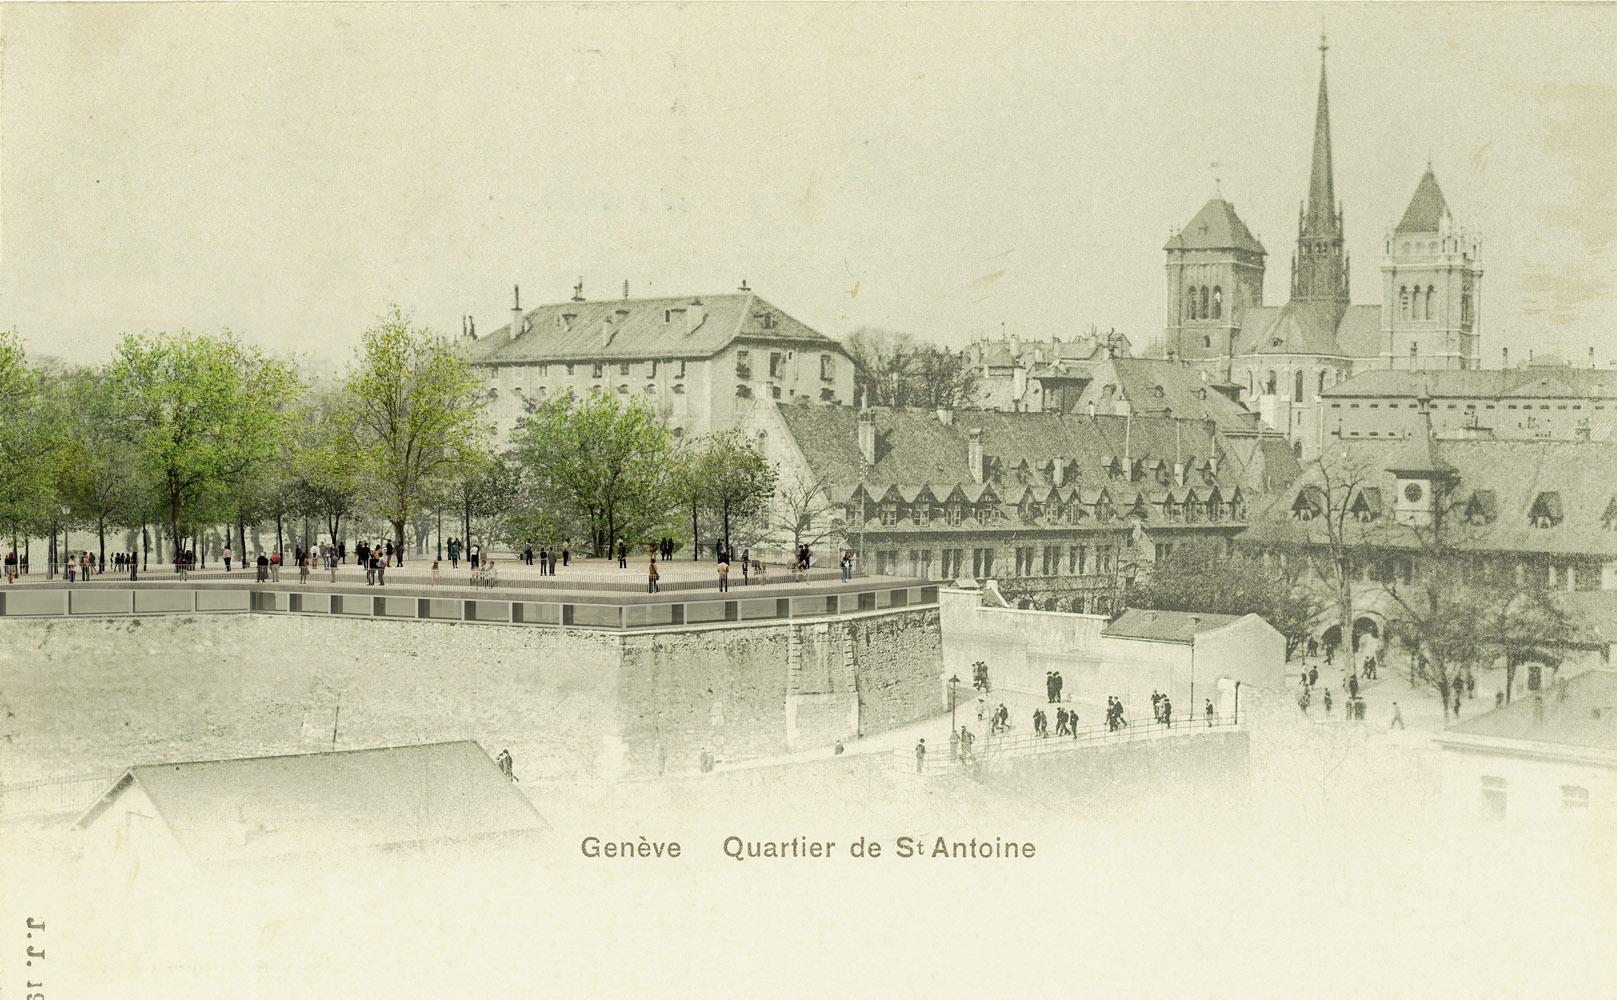 Bastion Saint-Antoine_Geneve_Switzerland